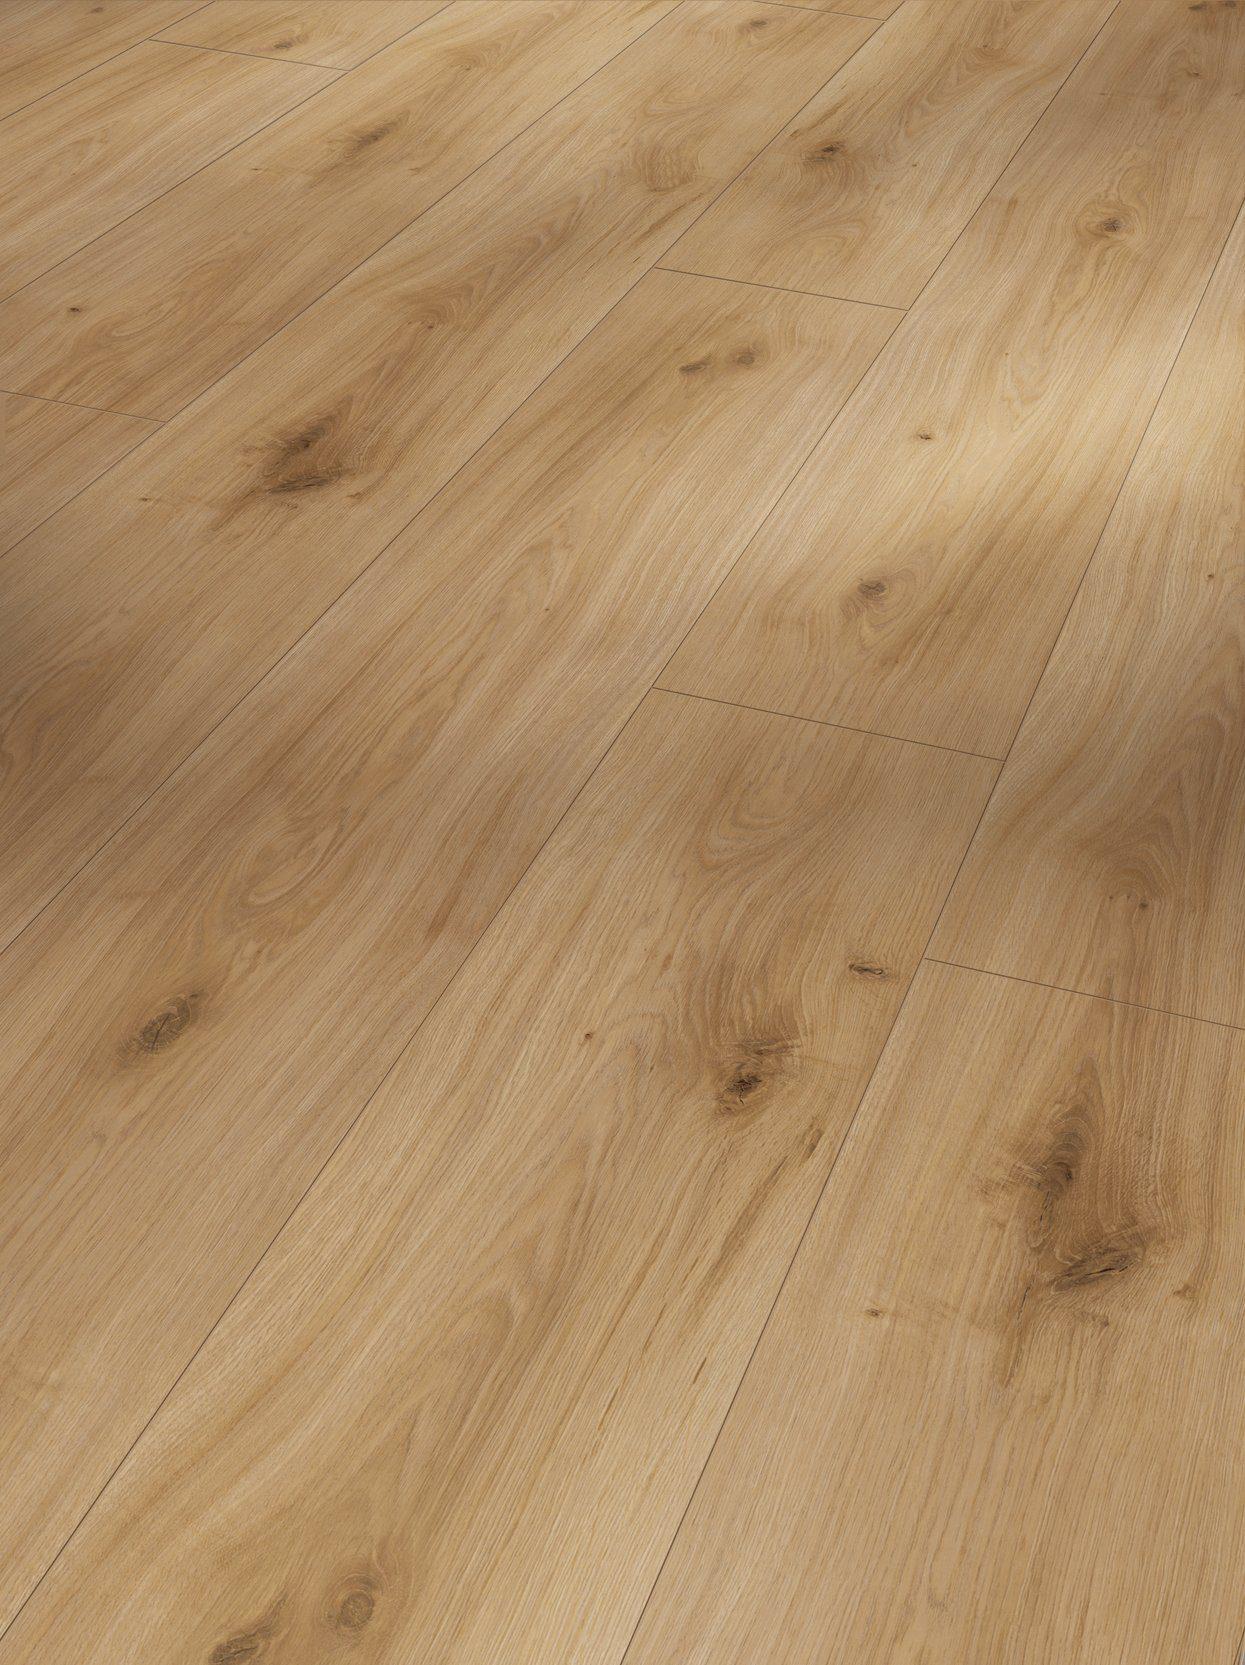 PARADOR Laminat »Basic 600 - Eiche Horizont Natur«, 1285 x 243 mm, Stärke: 8 mm